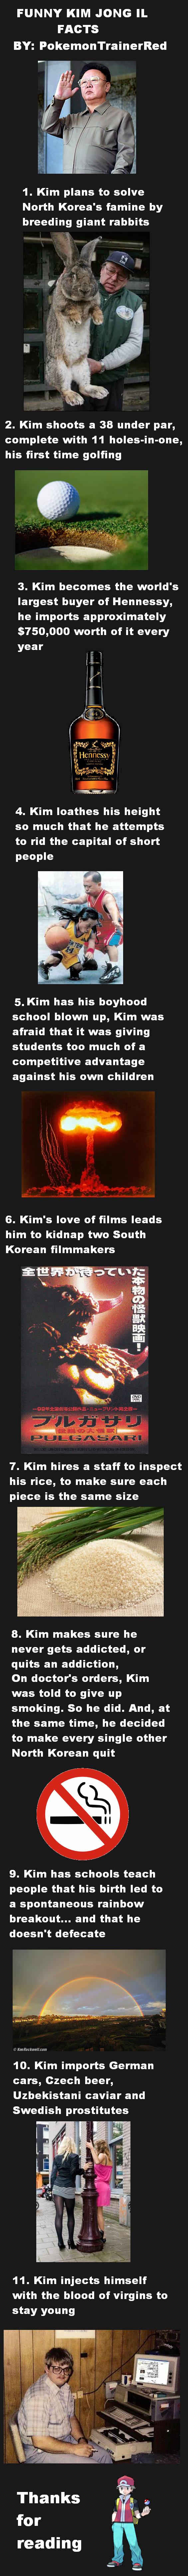 11 Funny Kim Jong il Facts. 11 Funny Kim Jong il Facts.. <---------- Giant rabbits you say? funny kim jong il facts